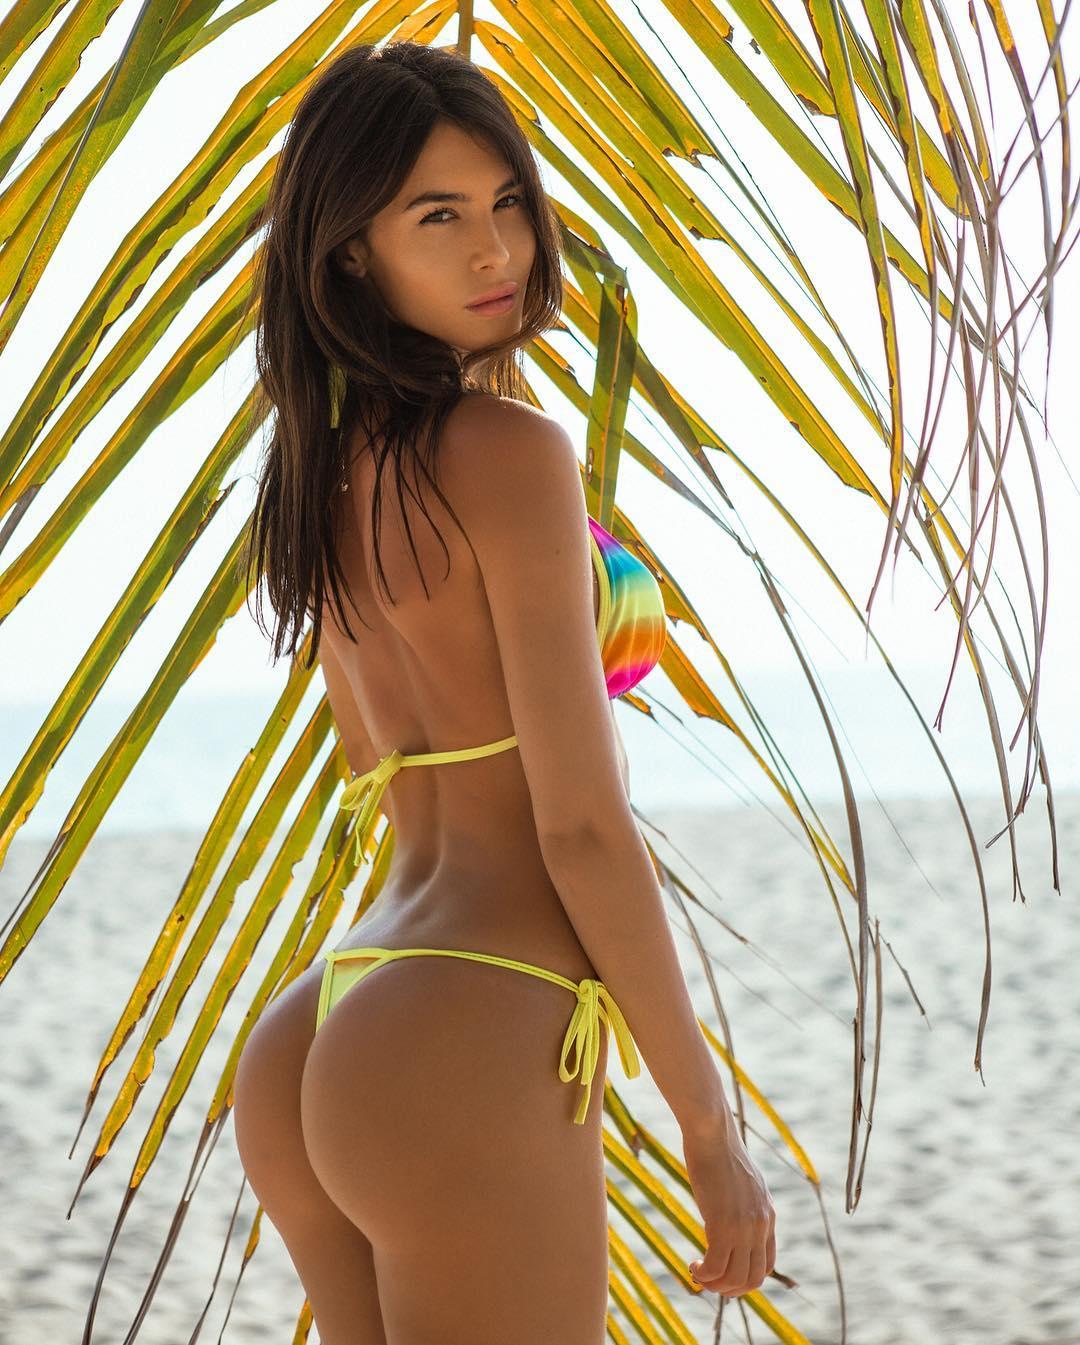 Bikini Silvia Caruso naked (74 photo), Sexy, Fappening, Boobs, cleavage 2018